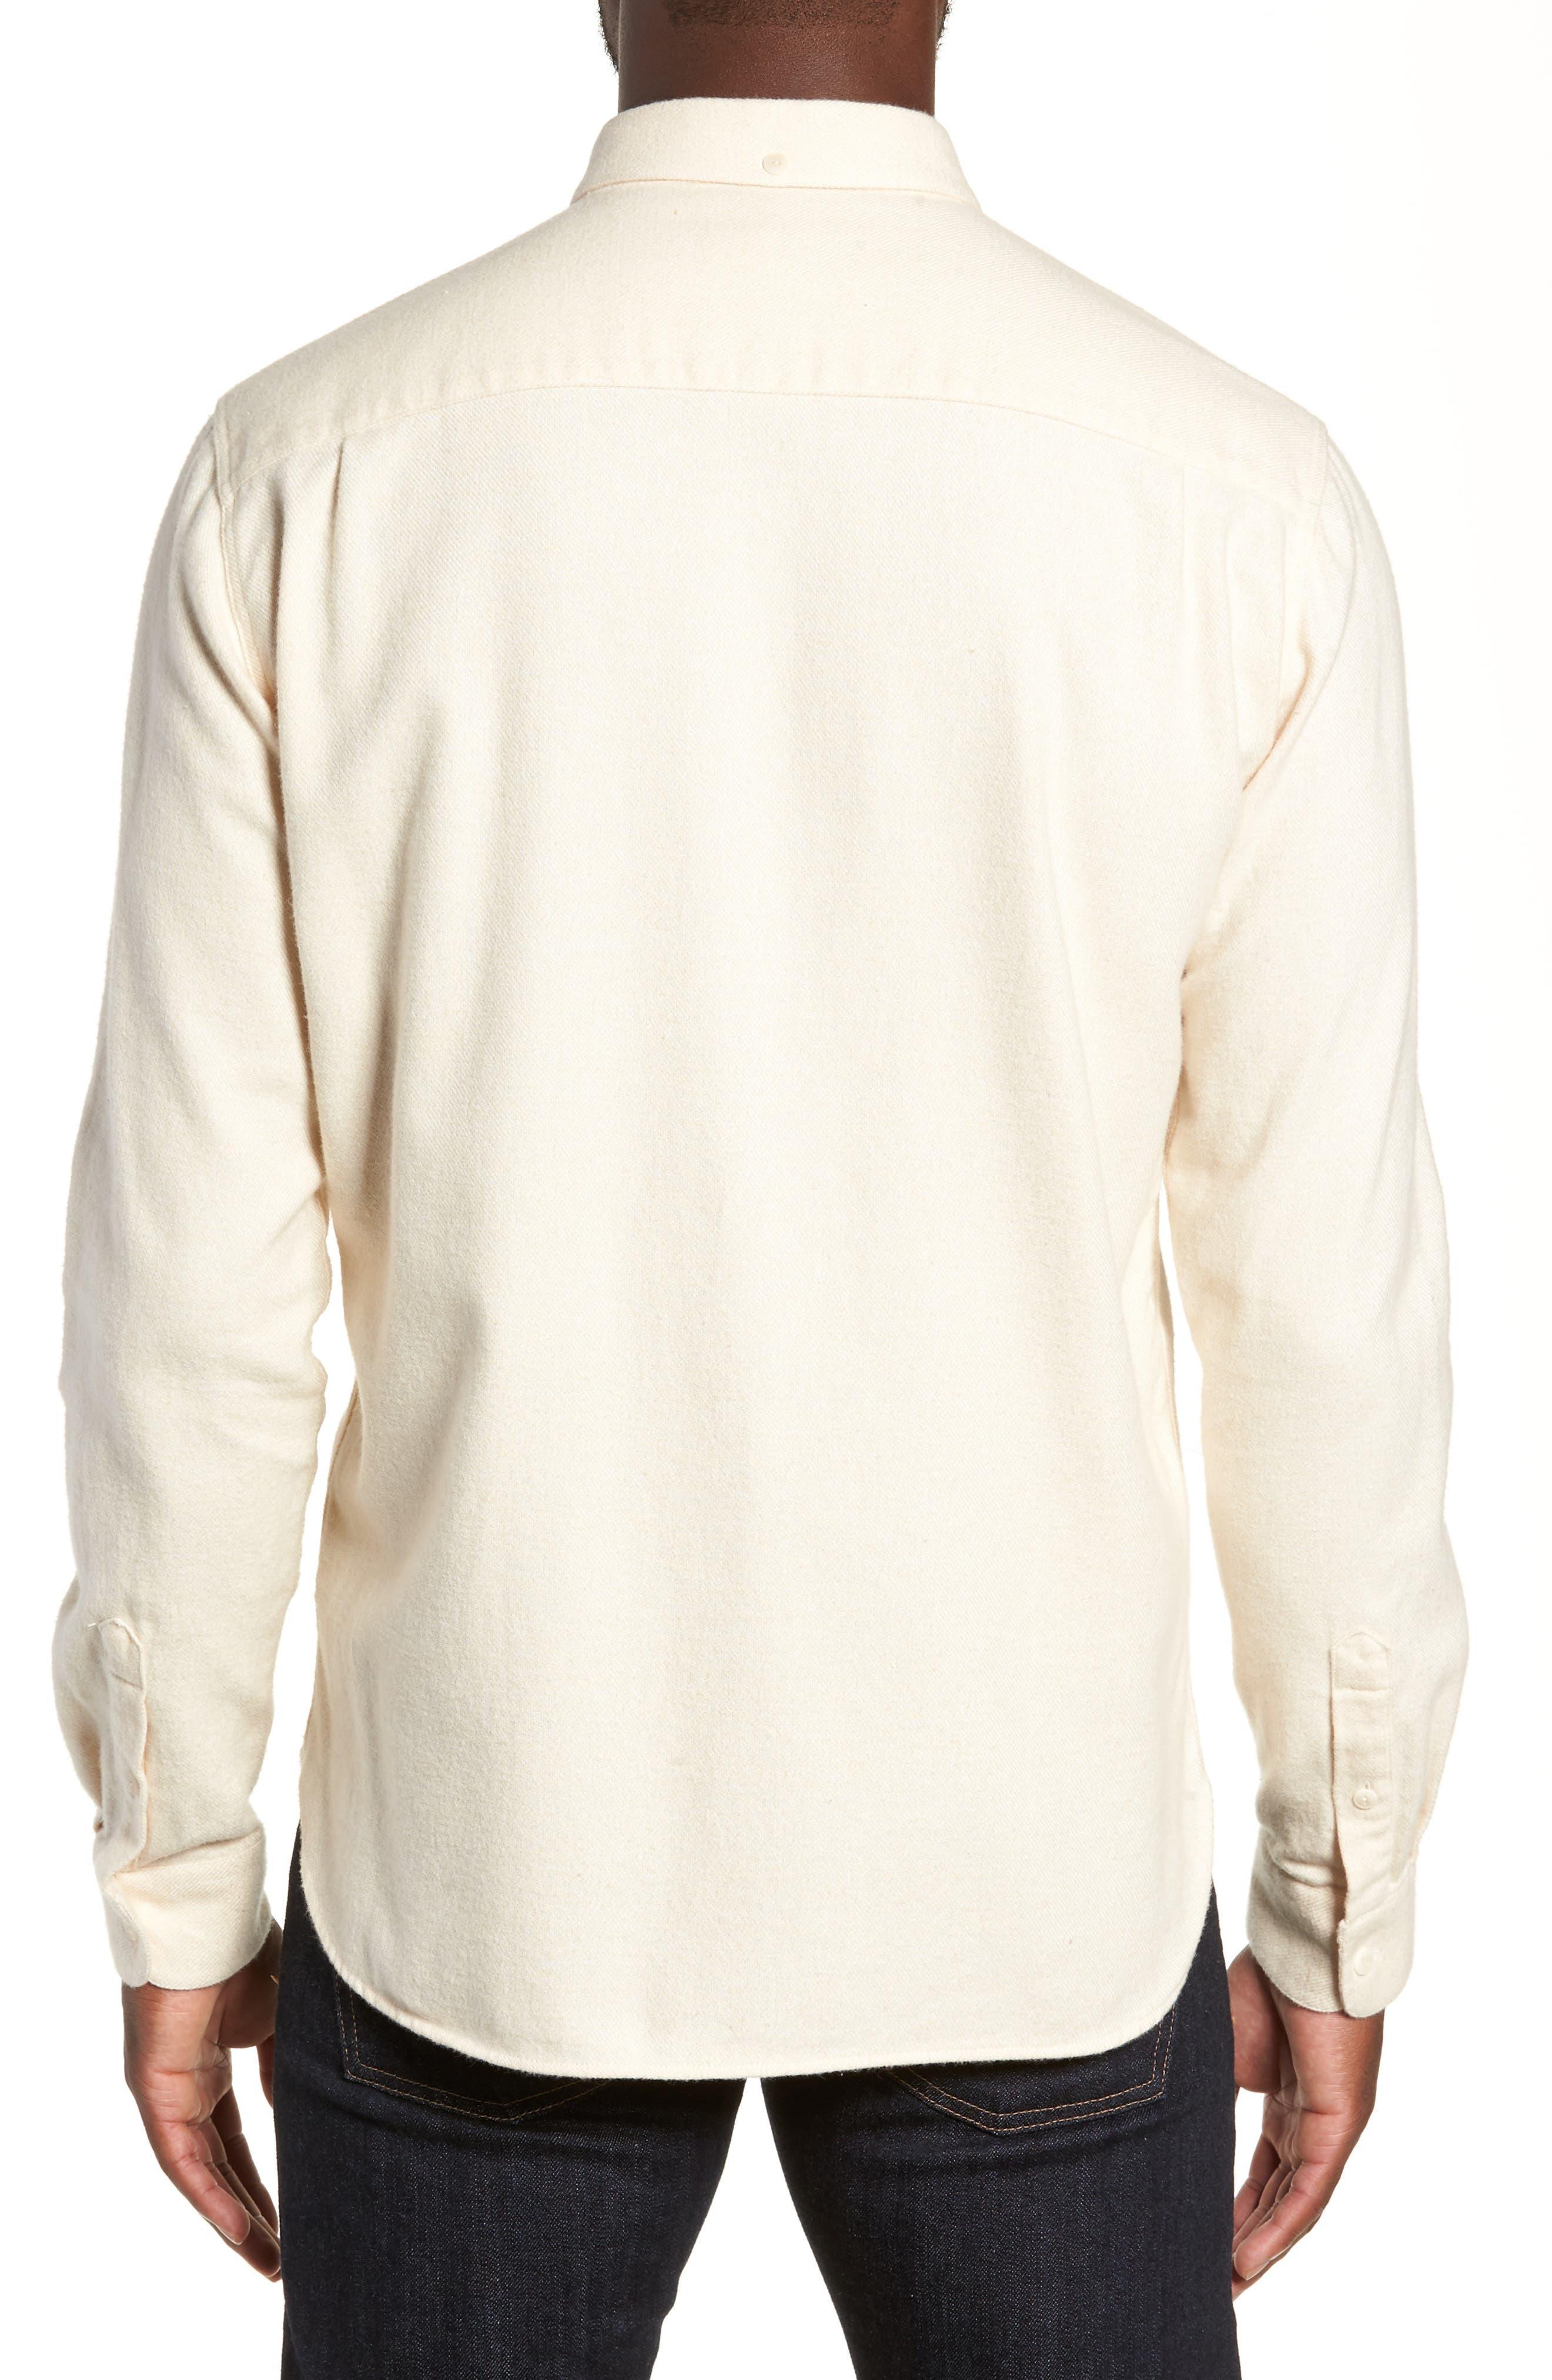 Marl Flannel Shirt,                             Alternate thumbnail 3, color,                             ECRU